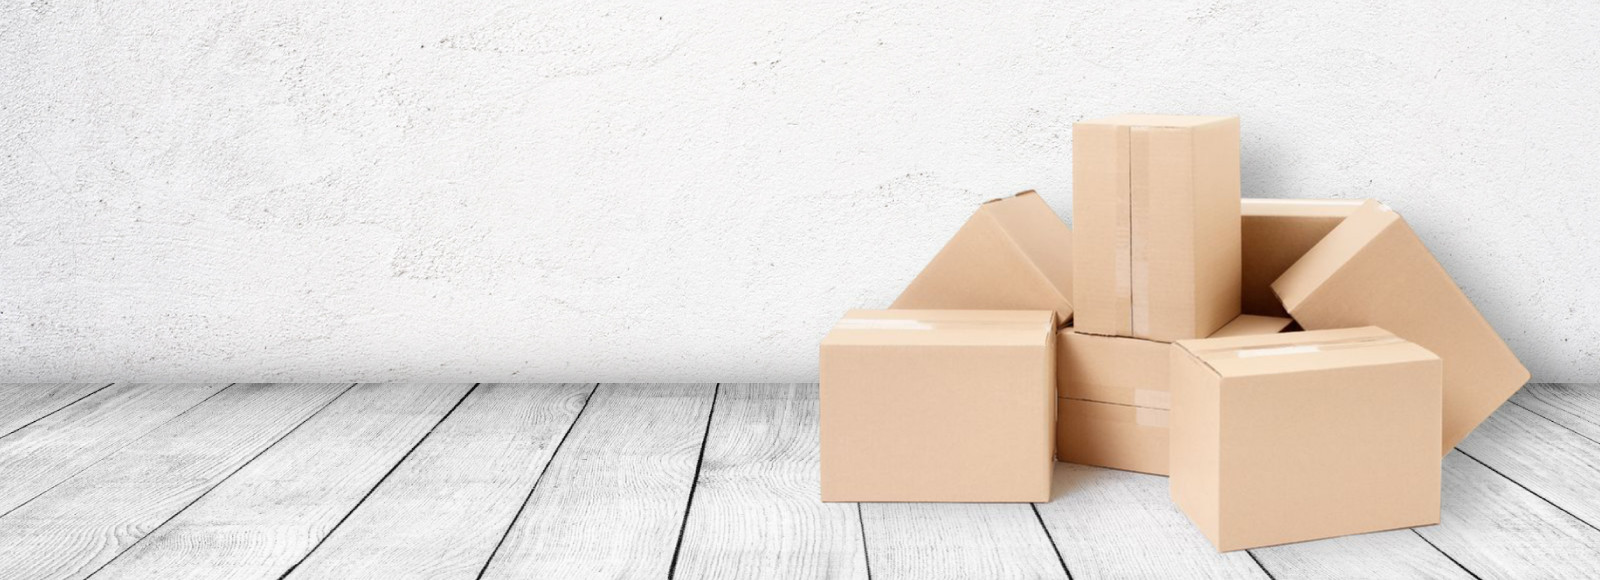 rp-boxes-sliders-pozadi1-01